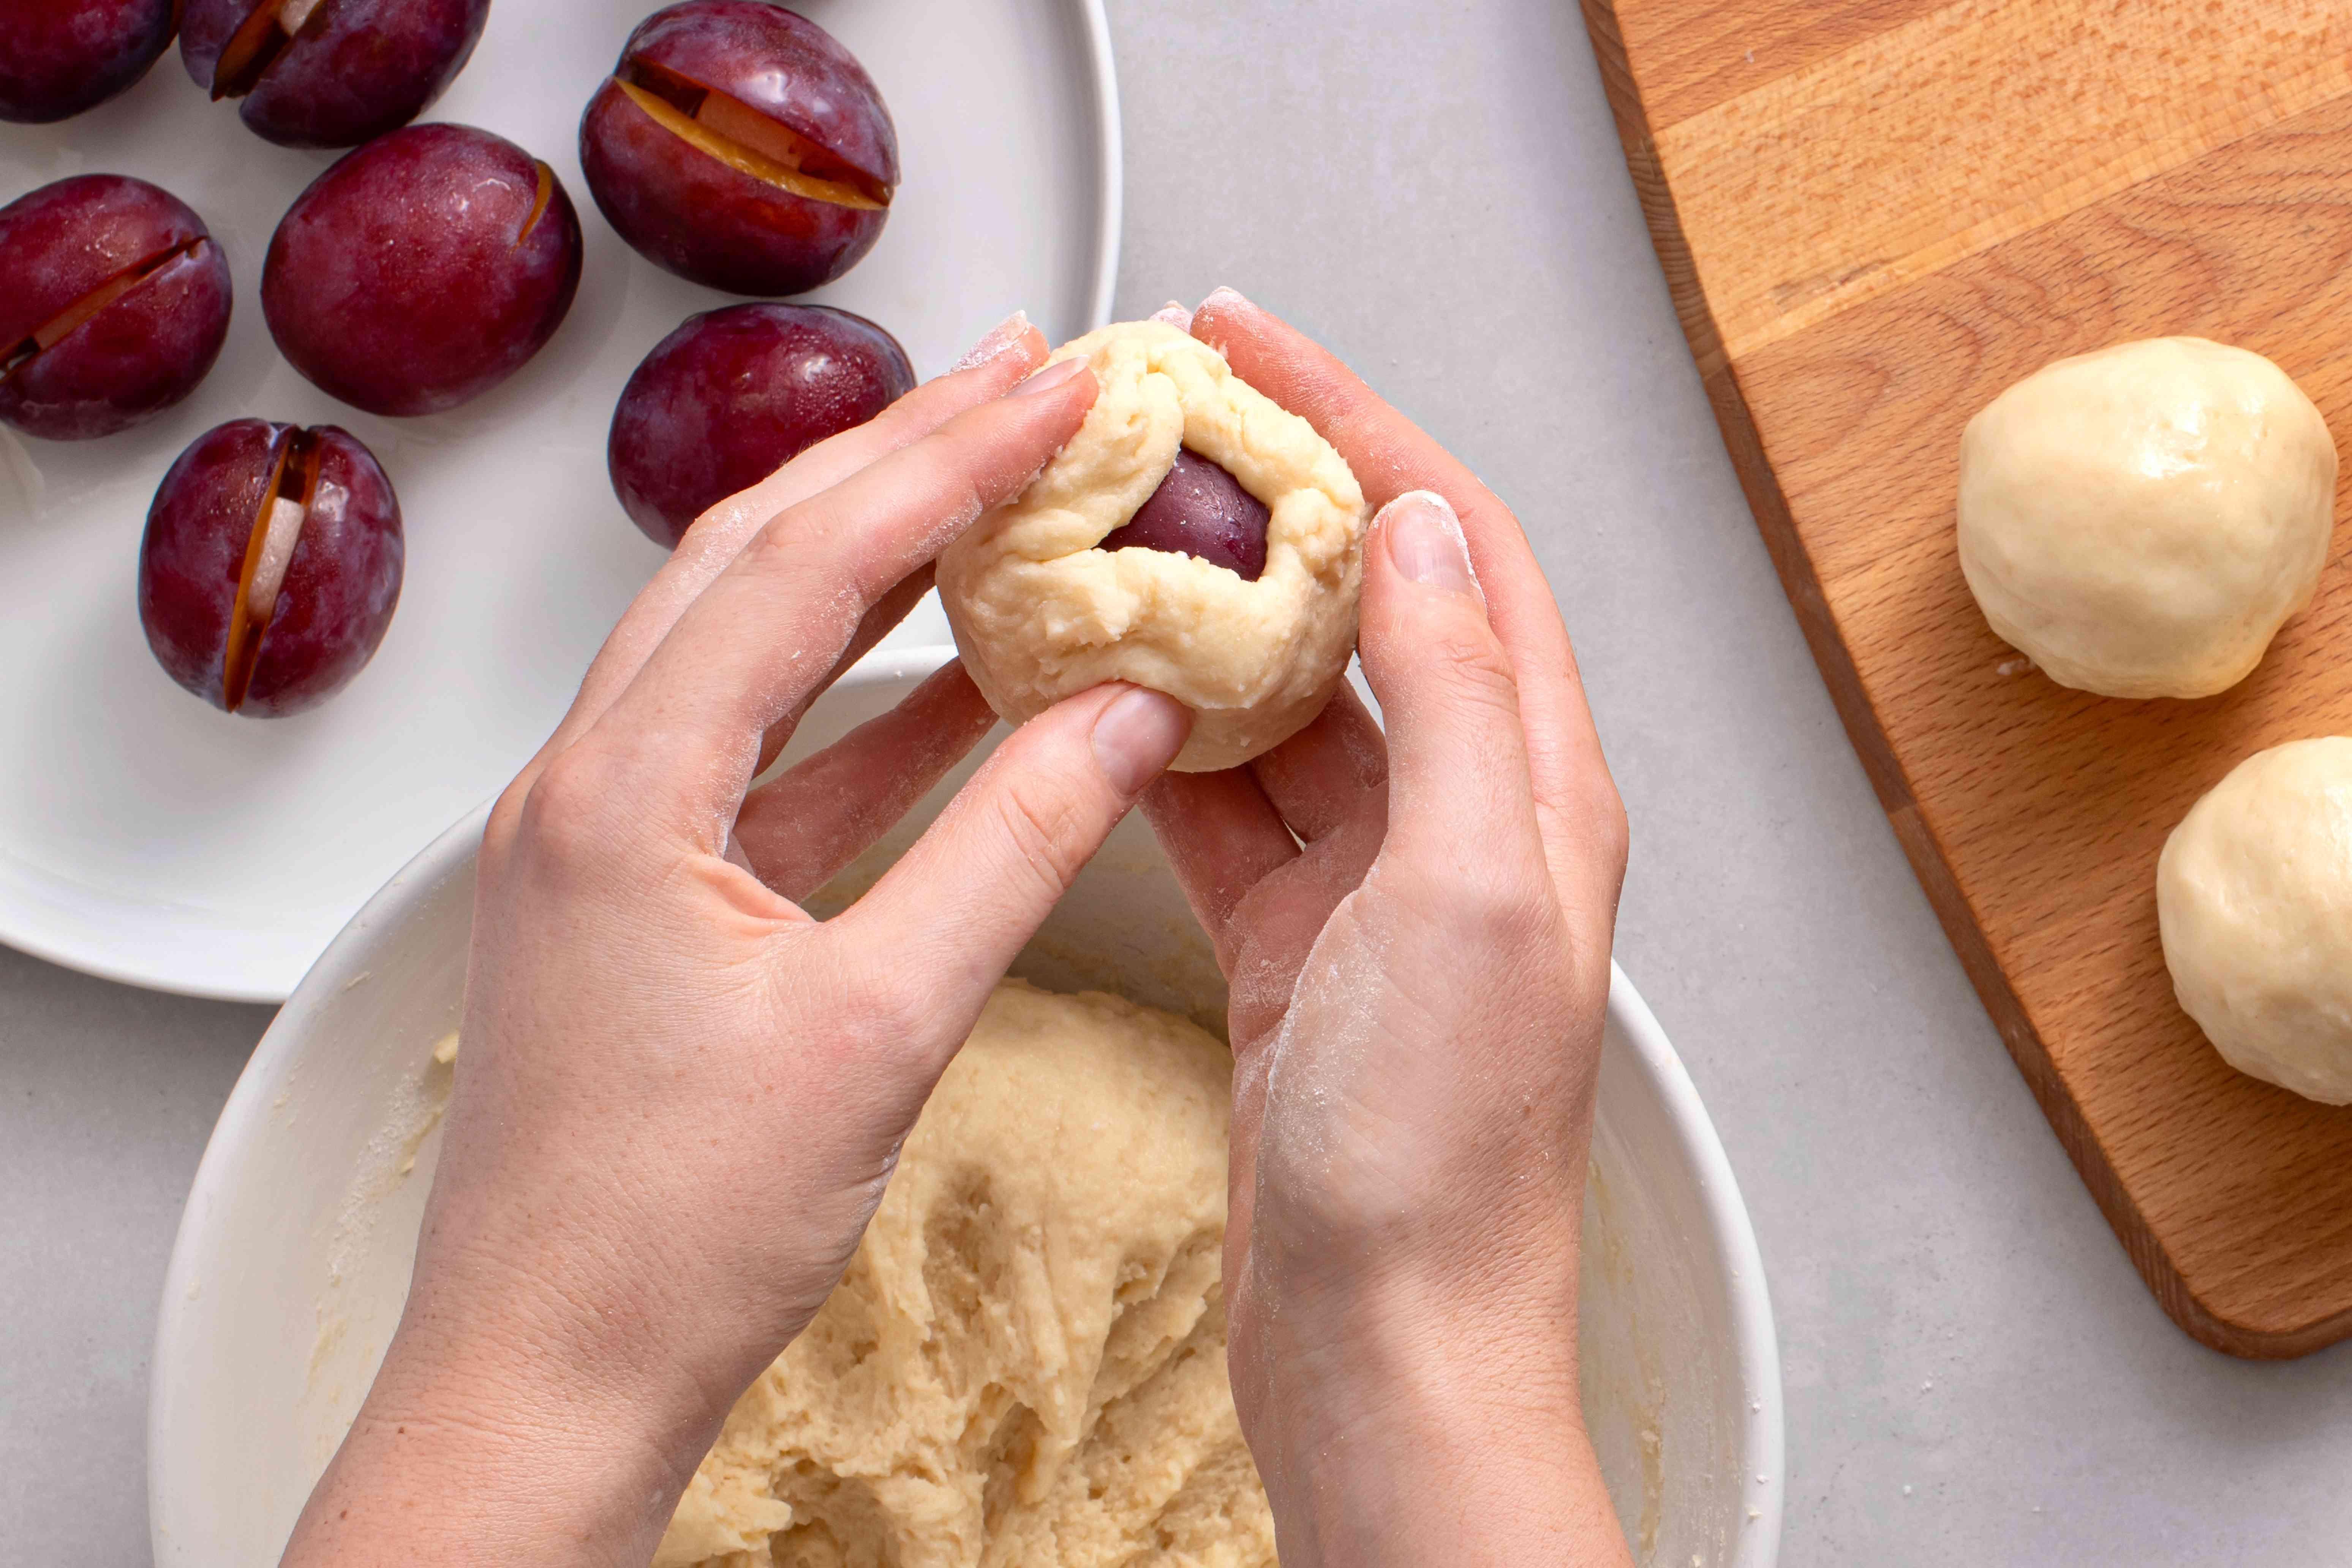 dough wrapped around plum